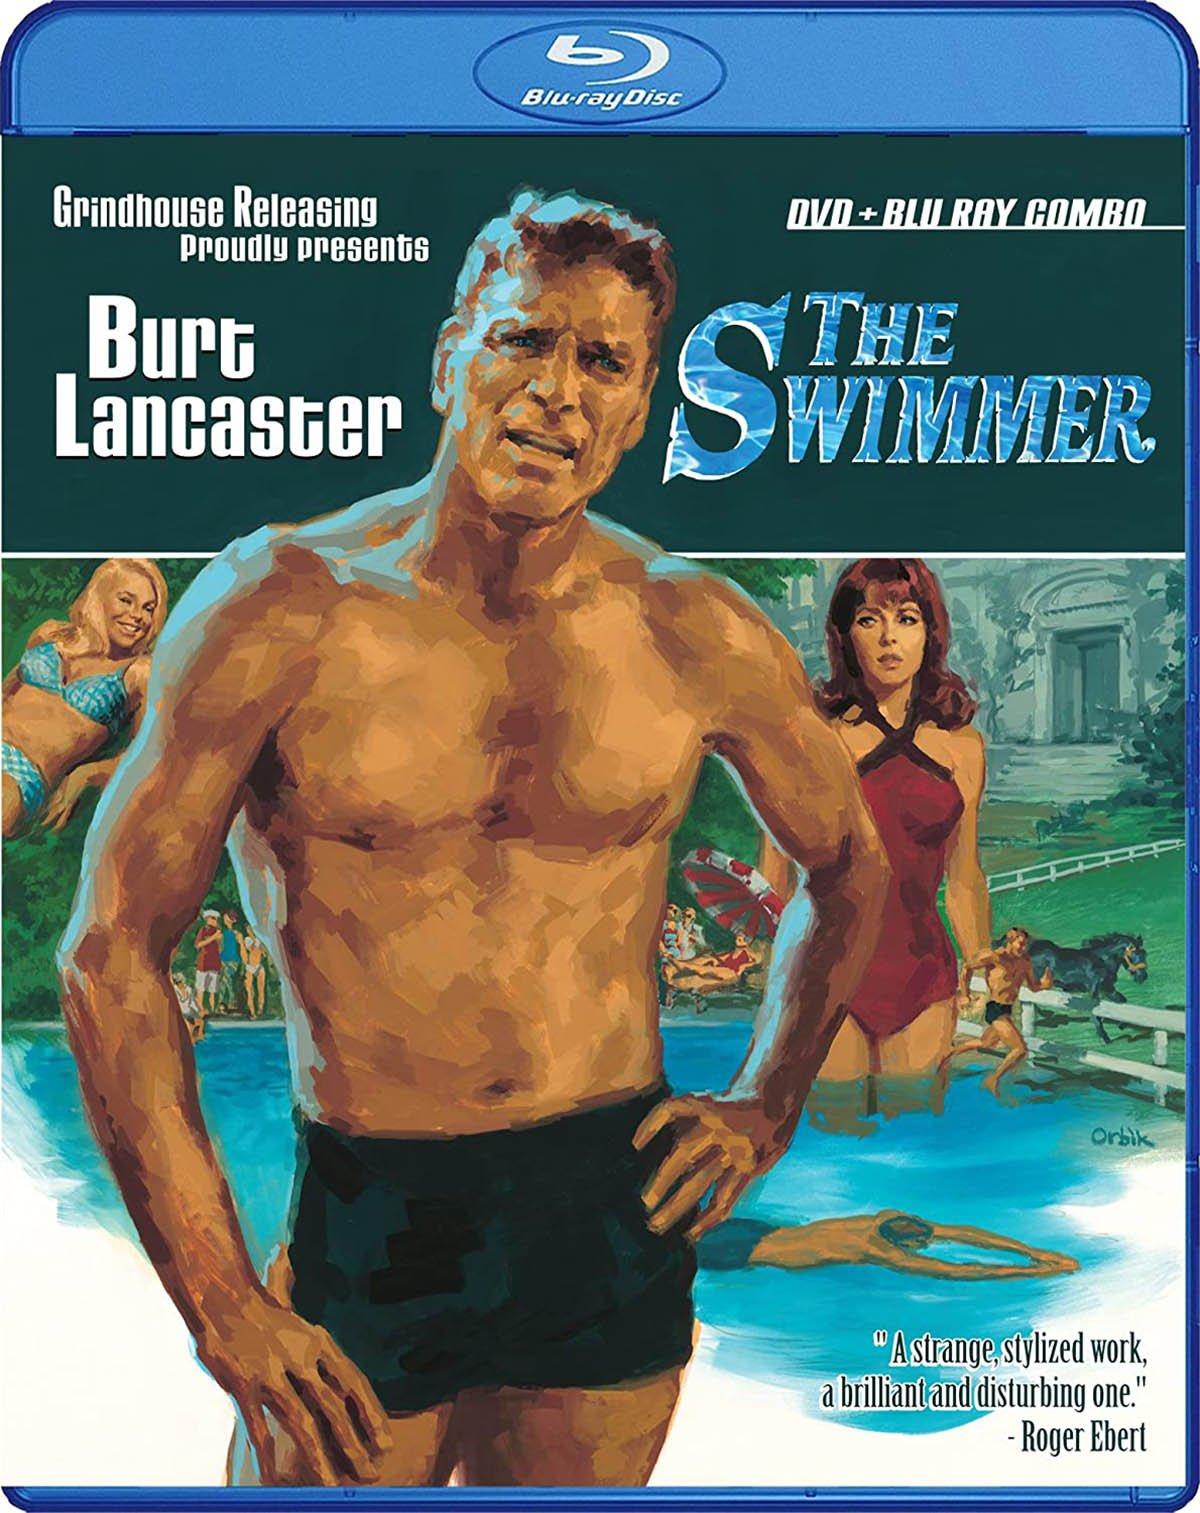 c90ea23f33 Blu-ray Review: The Swimmer - Slant Magazine